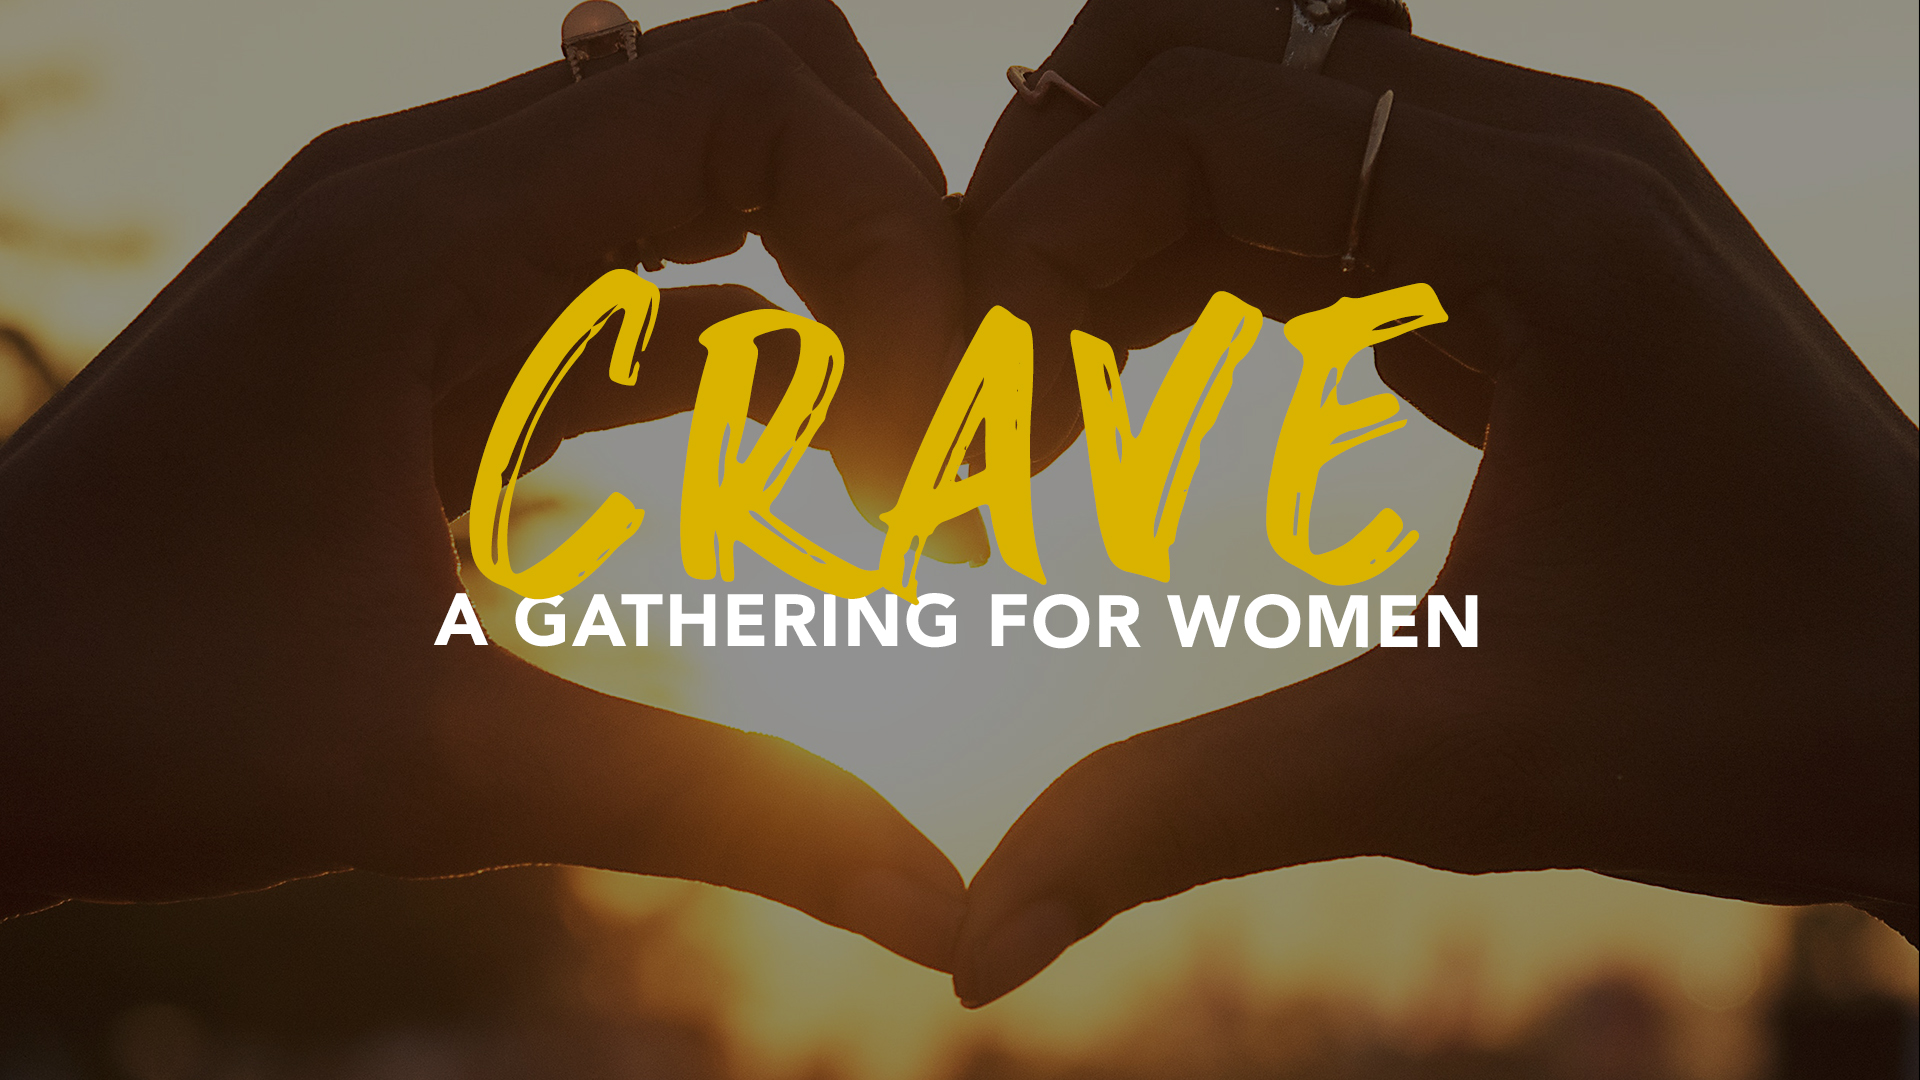 Crave_gatheringforwomen.jpg